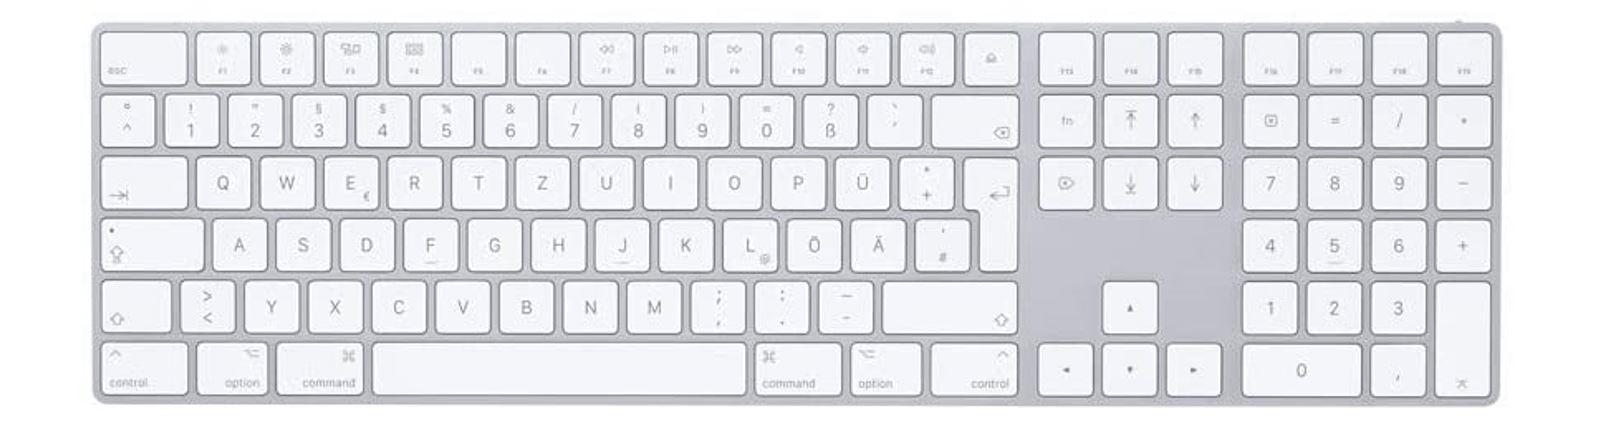 Apple Magic Keyboard with Numeric Keypad Press Image